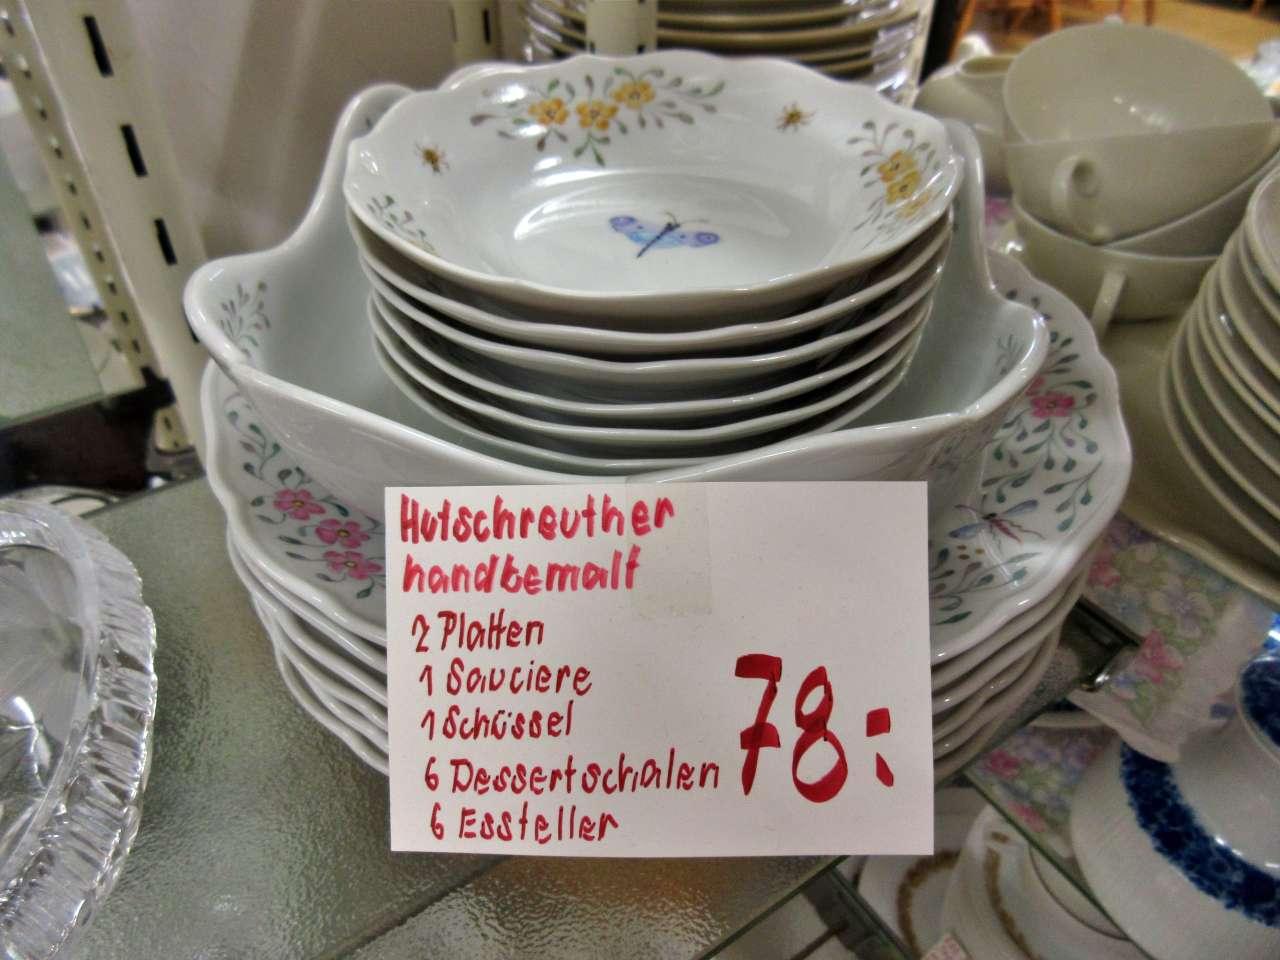 Porzellan Geschirr Hutschenreuther handbemalt